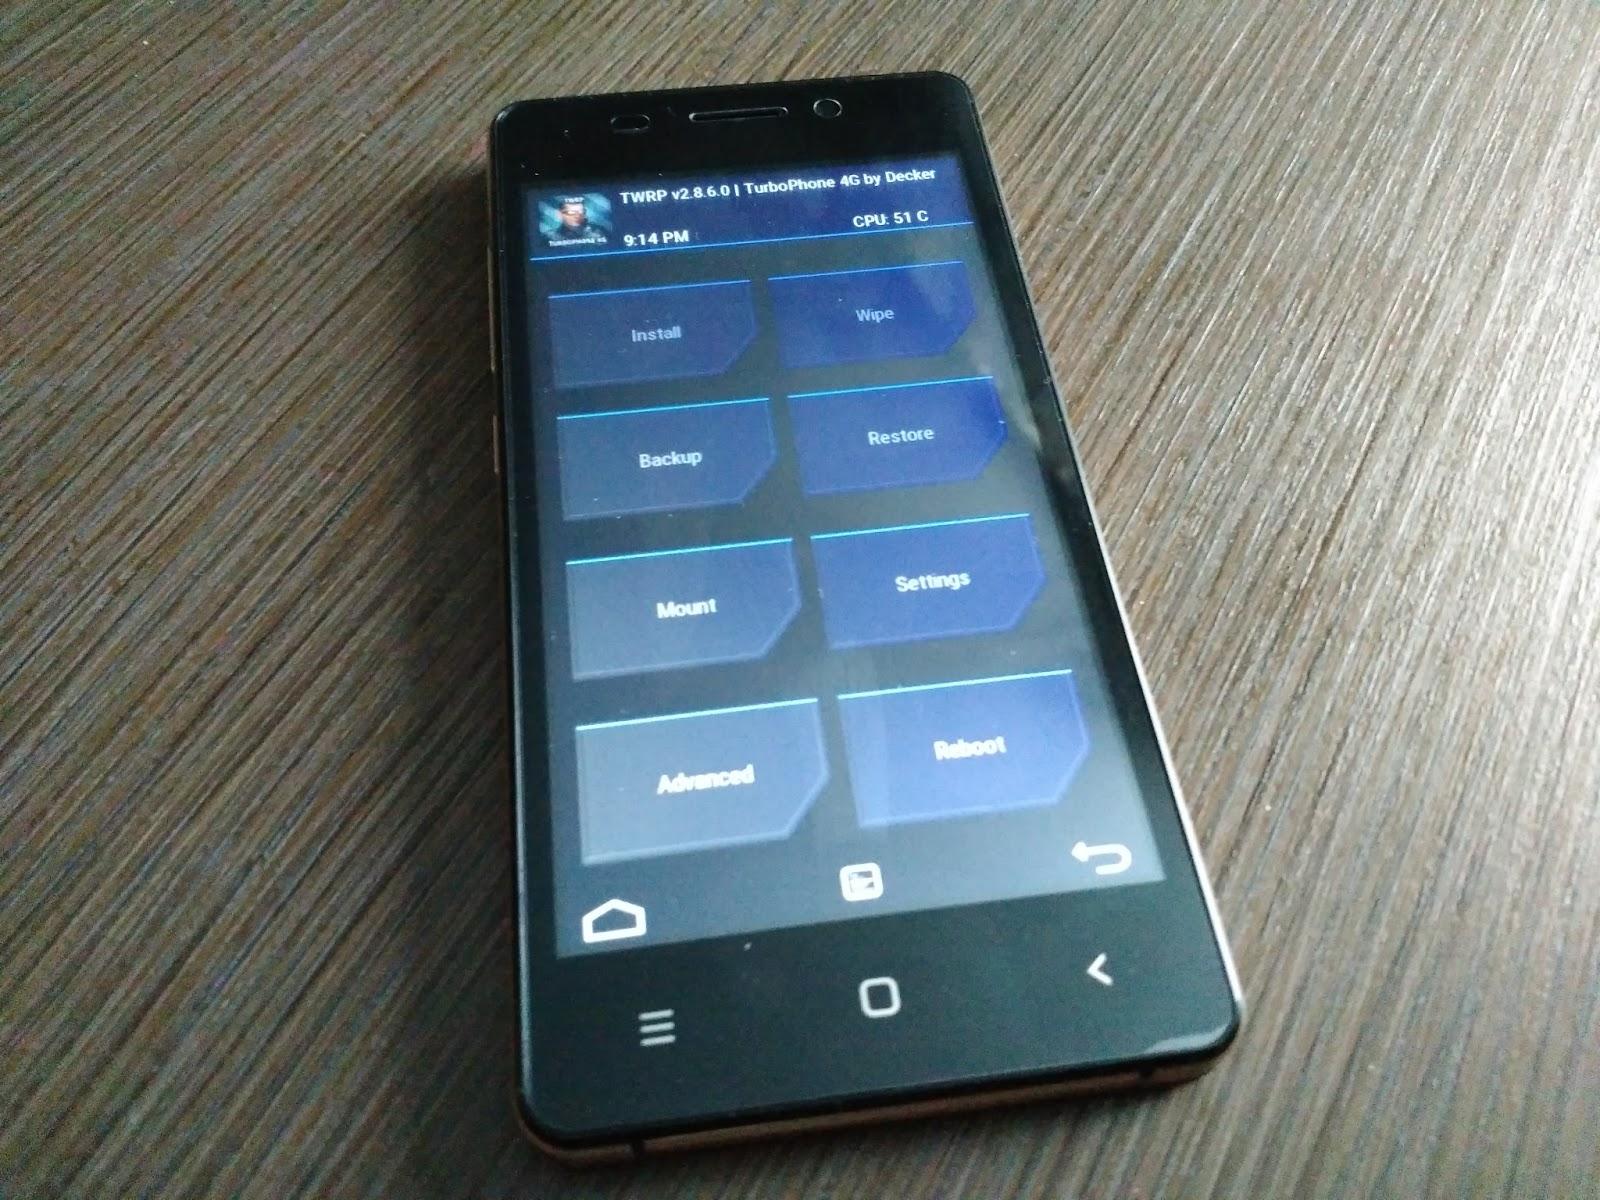 www.Decker.su: TurboPhone 4G. Обзор операторских устройств от Мотив. Часть 1.